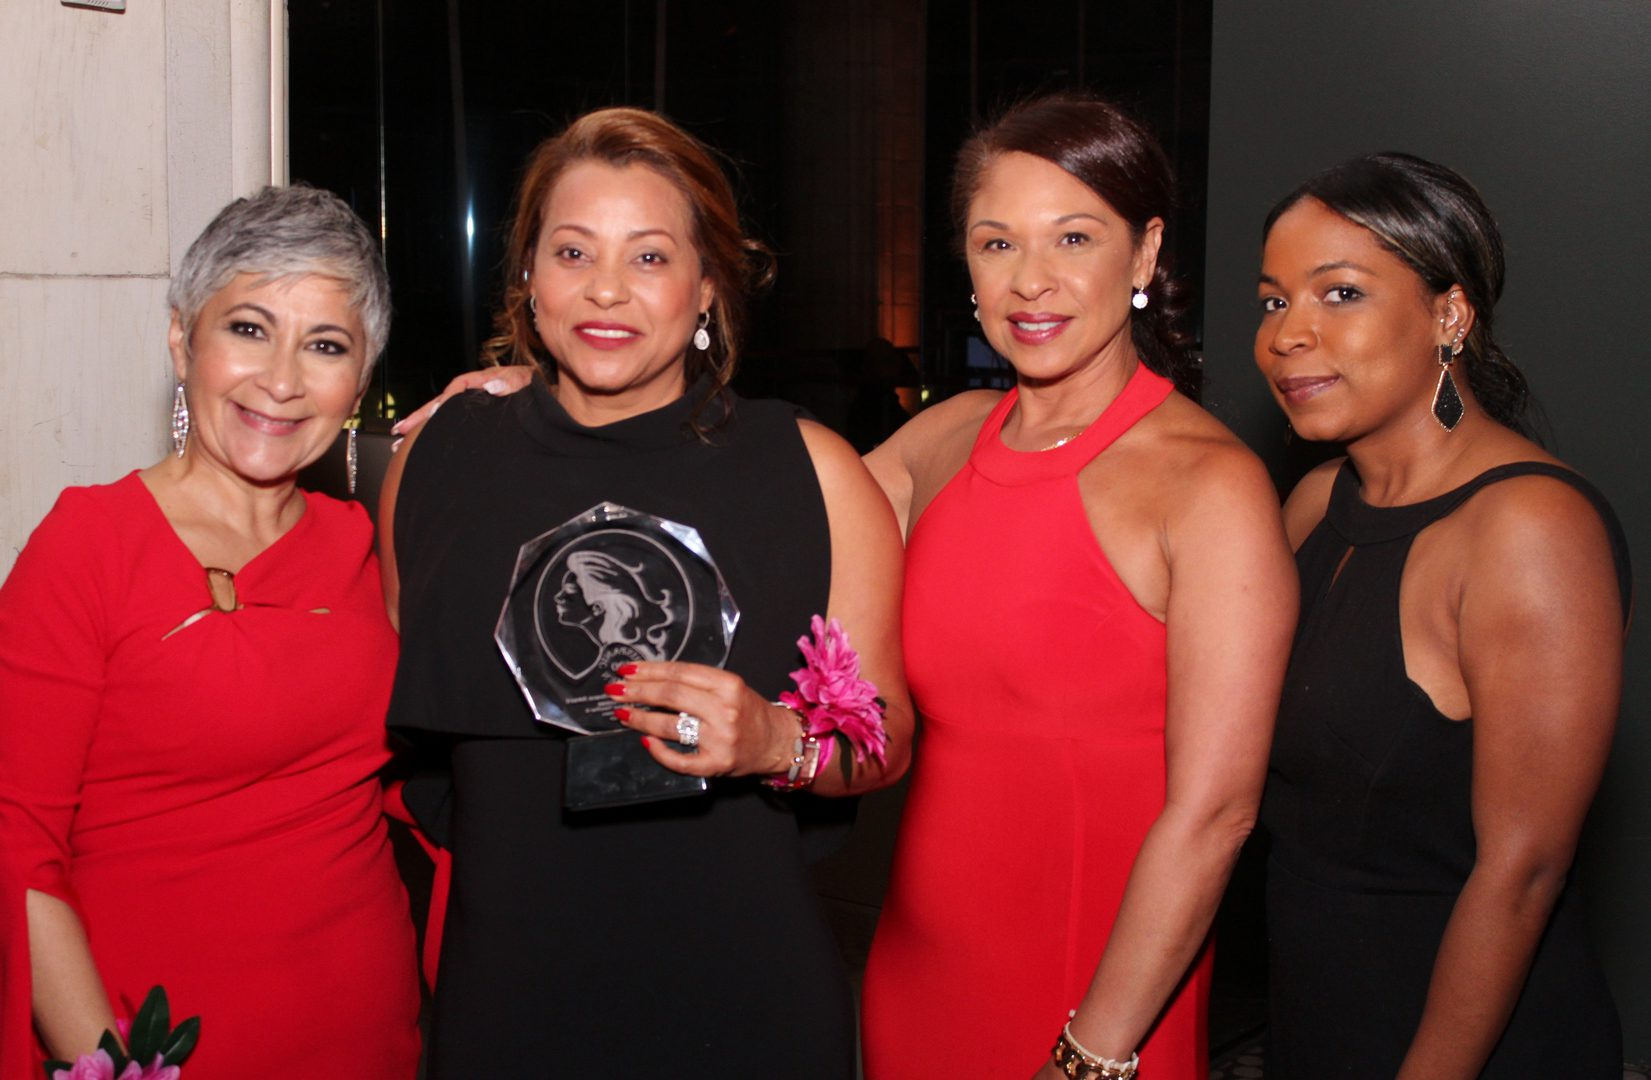 A group of women in elegant dressses